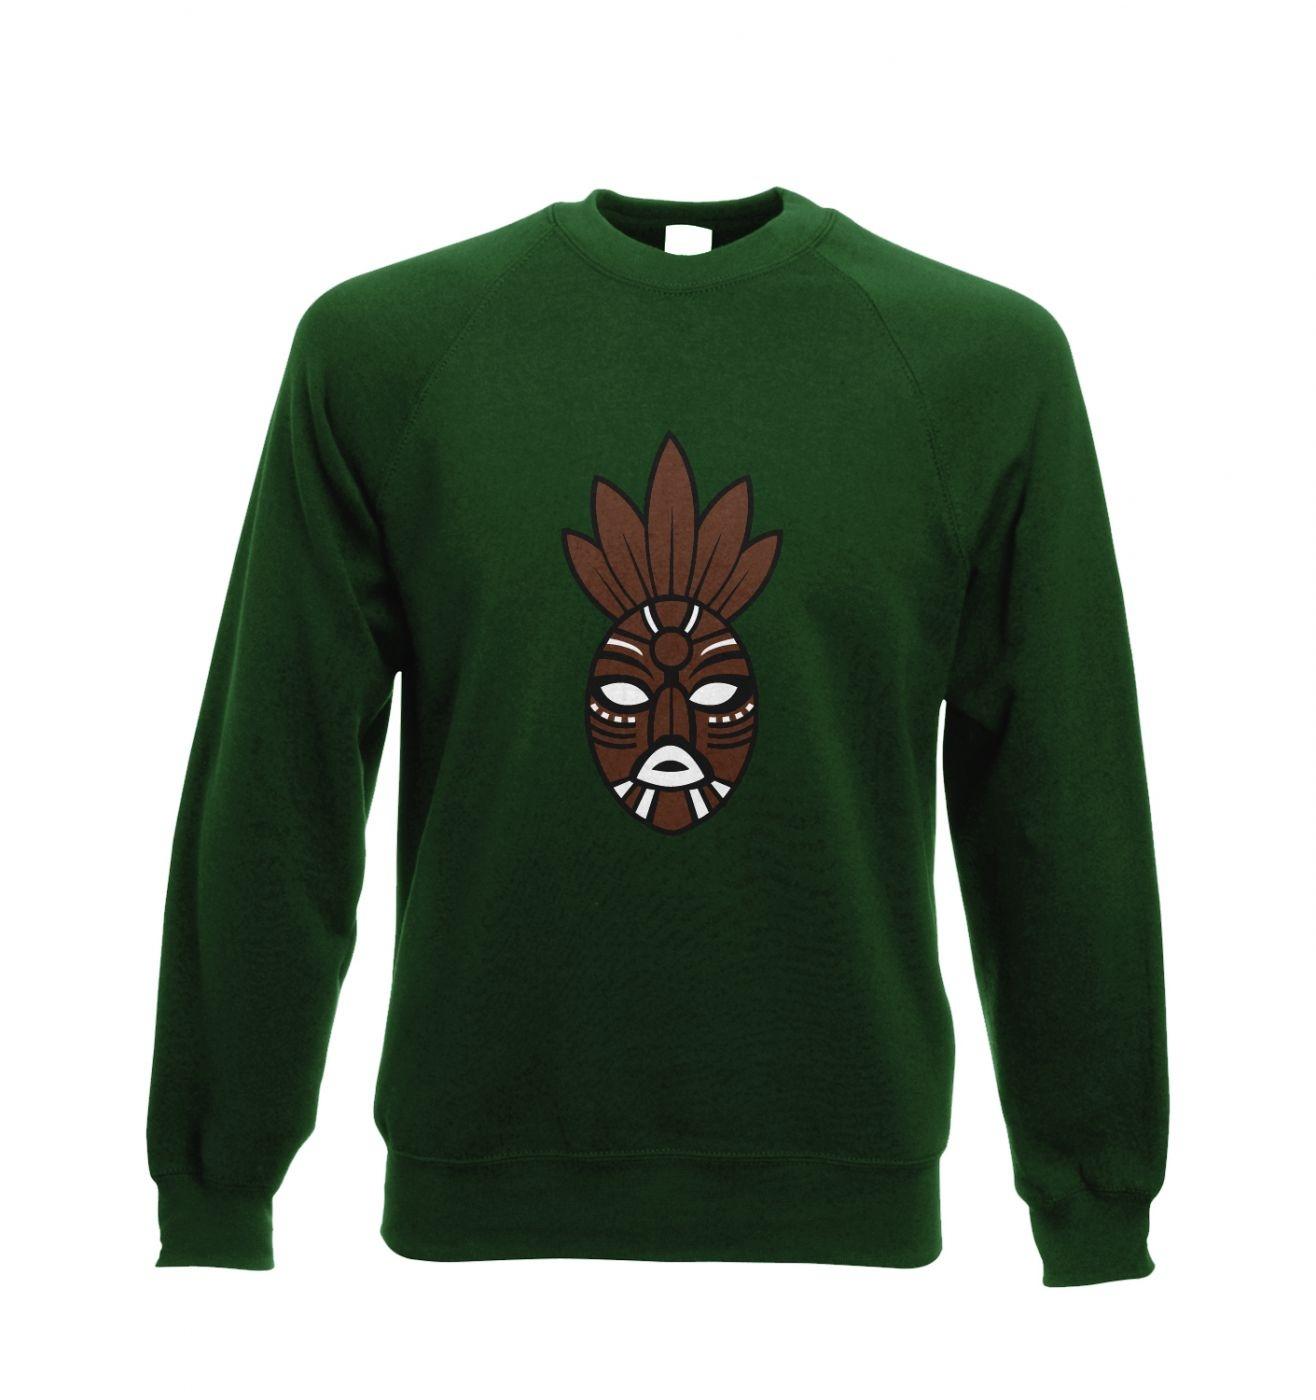 Brown Tribal Mask adult crewneck sweatshirt